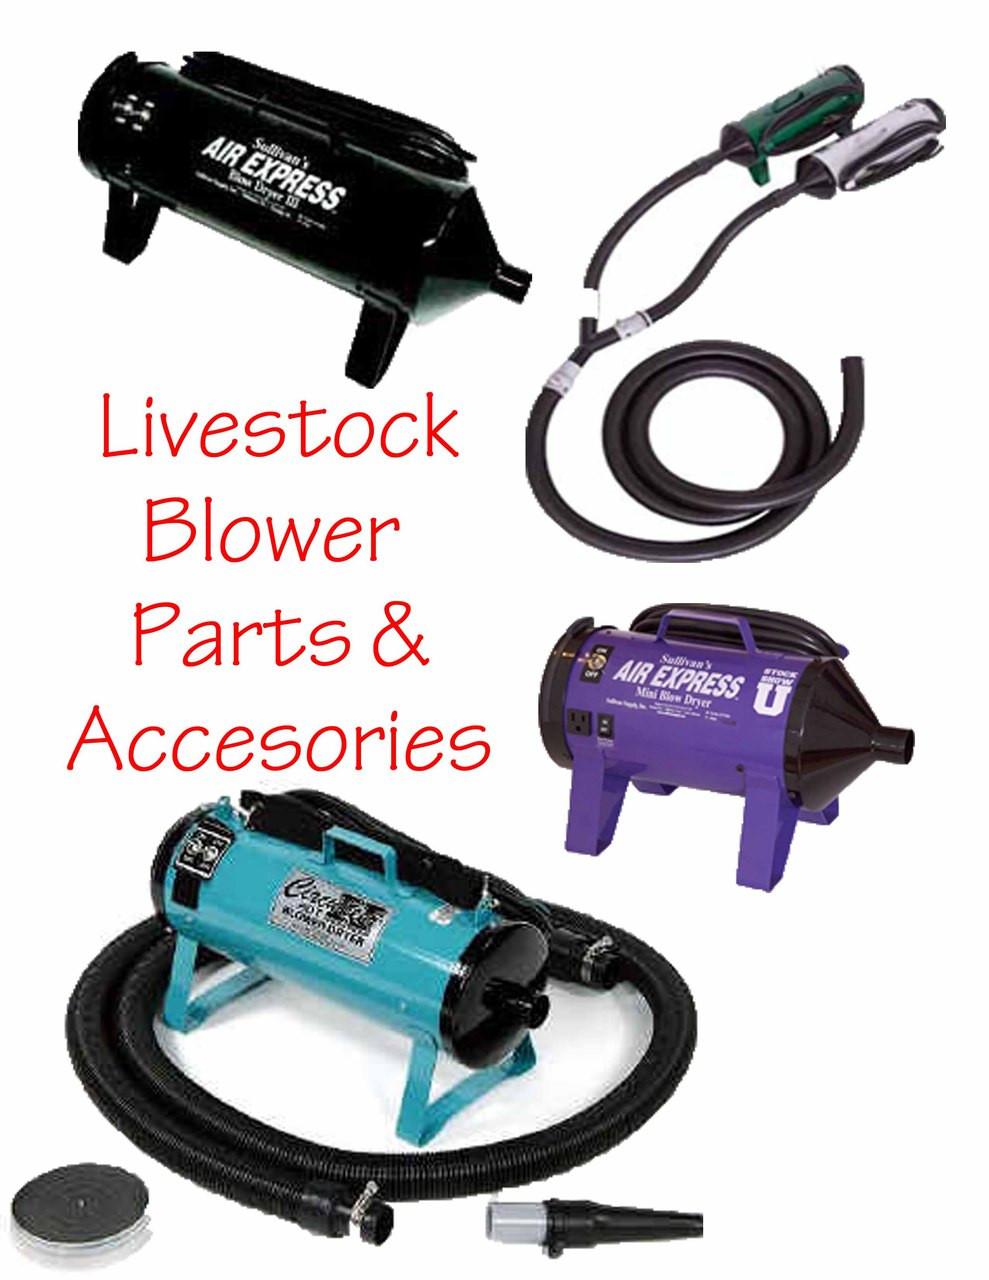 Livestock Blower Parts Accesories Rk Animal Supplies Image 1